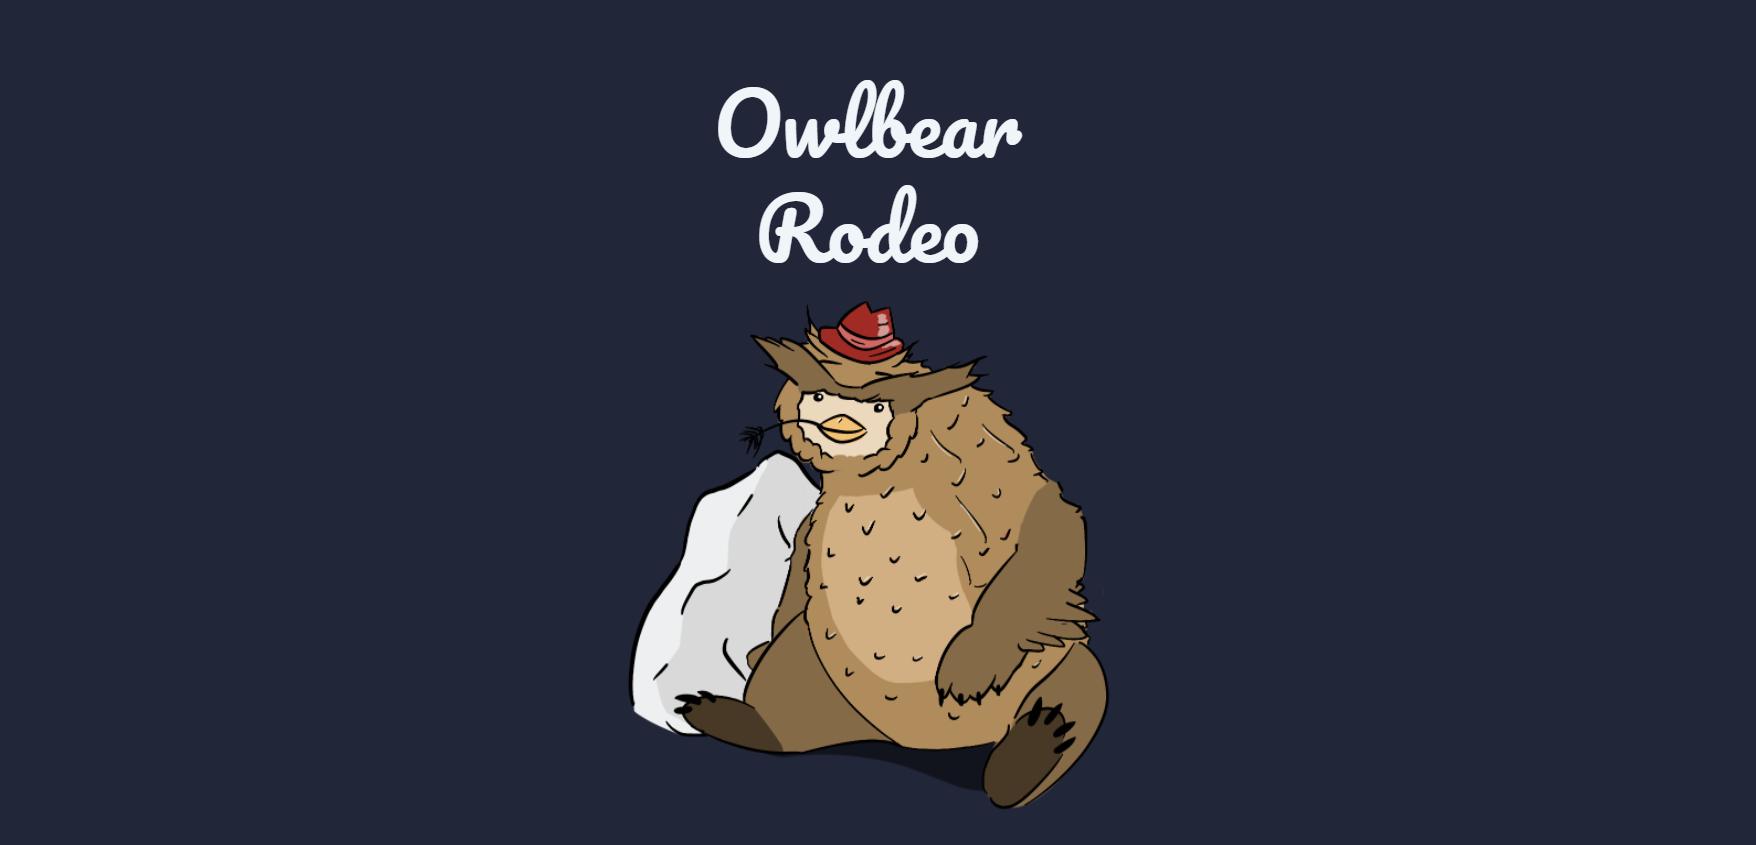 Owlbear Radio.png